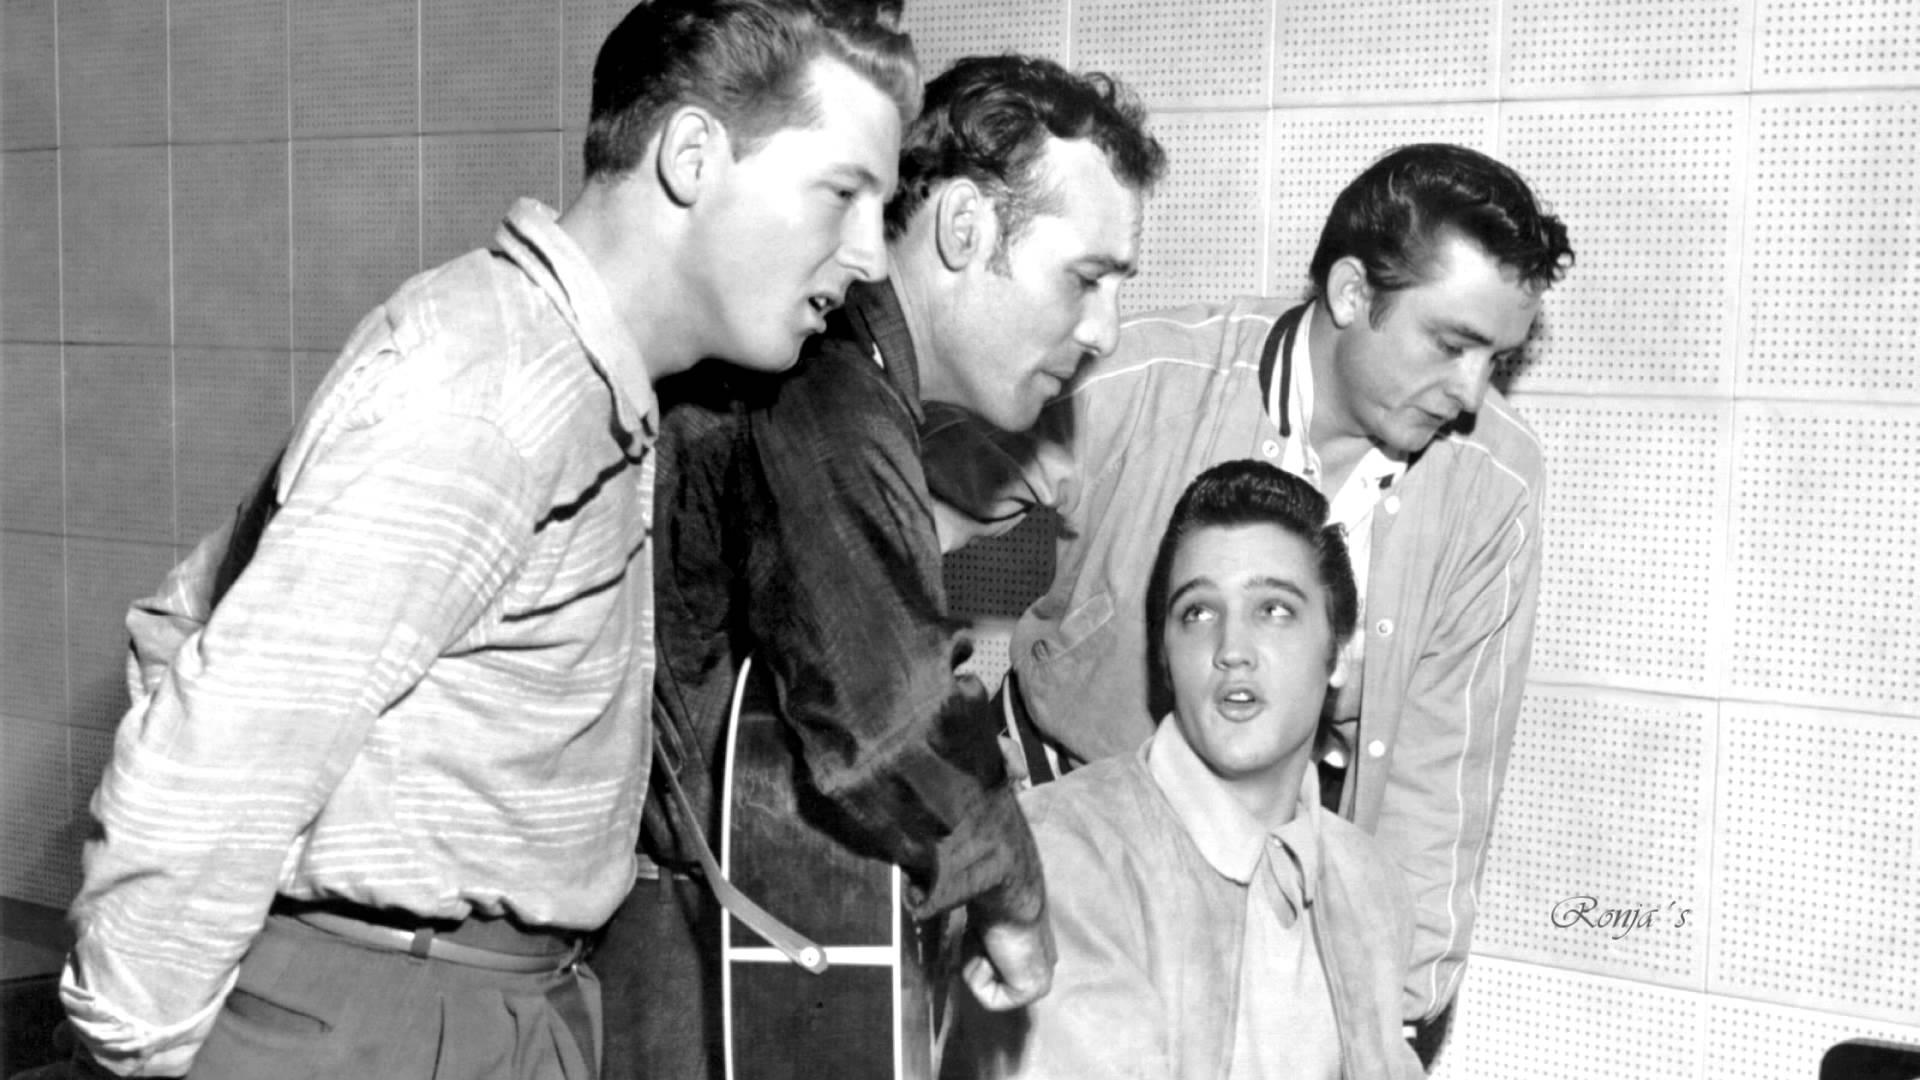 Million Dollar Quartet- Left to Right- Jerry Lee Lewis, Carl Perkins, Elvis Presley, Johnny Cash